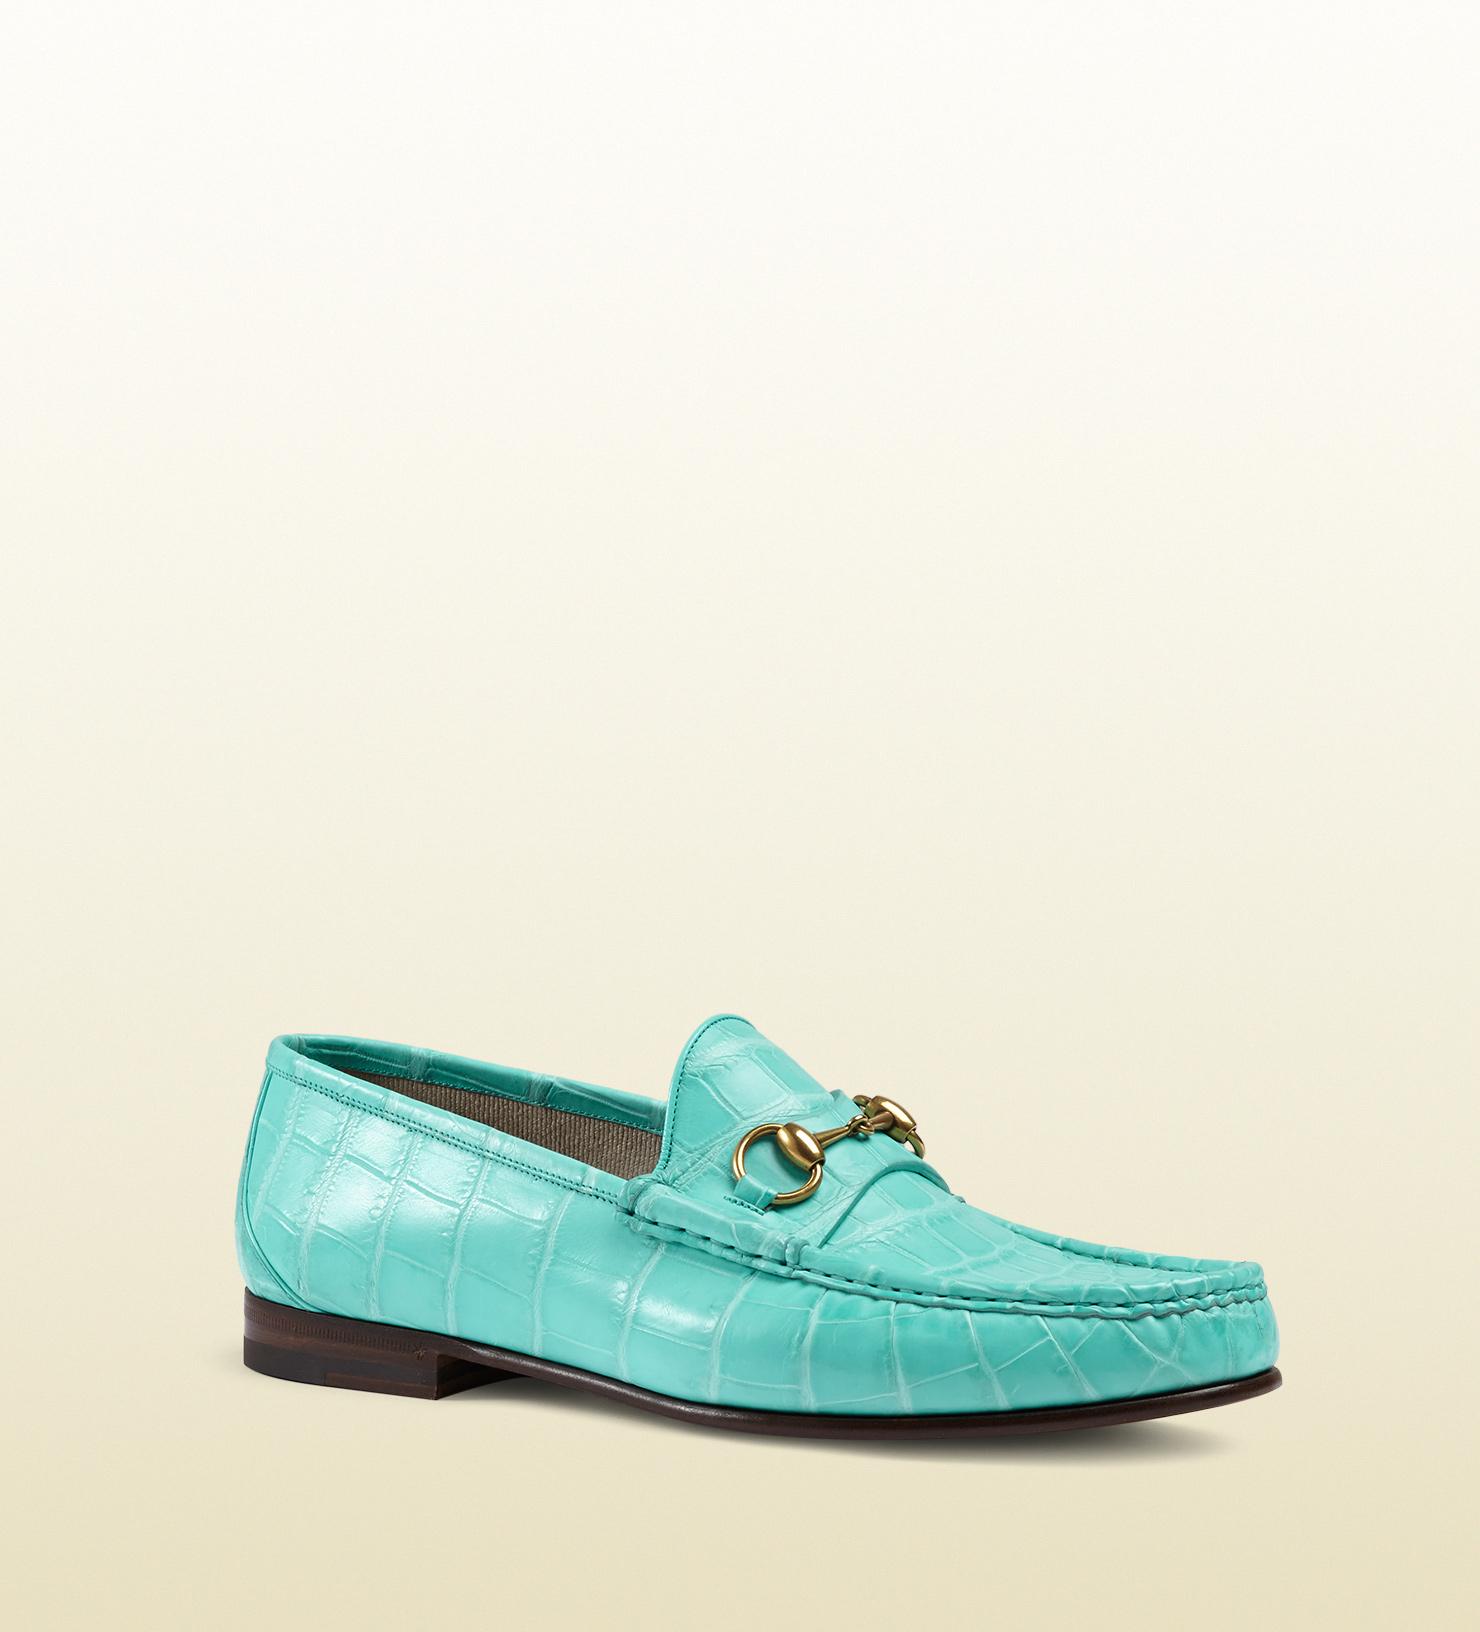 a32c8e8a8c7 Lyst - Gucci 1953 Horsebit Loafer In Crocodile in Blue for Men